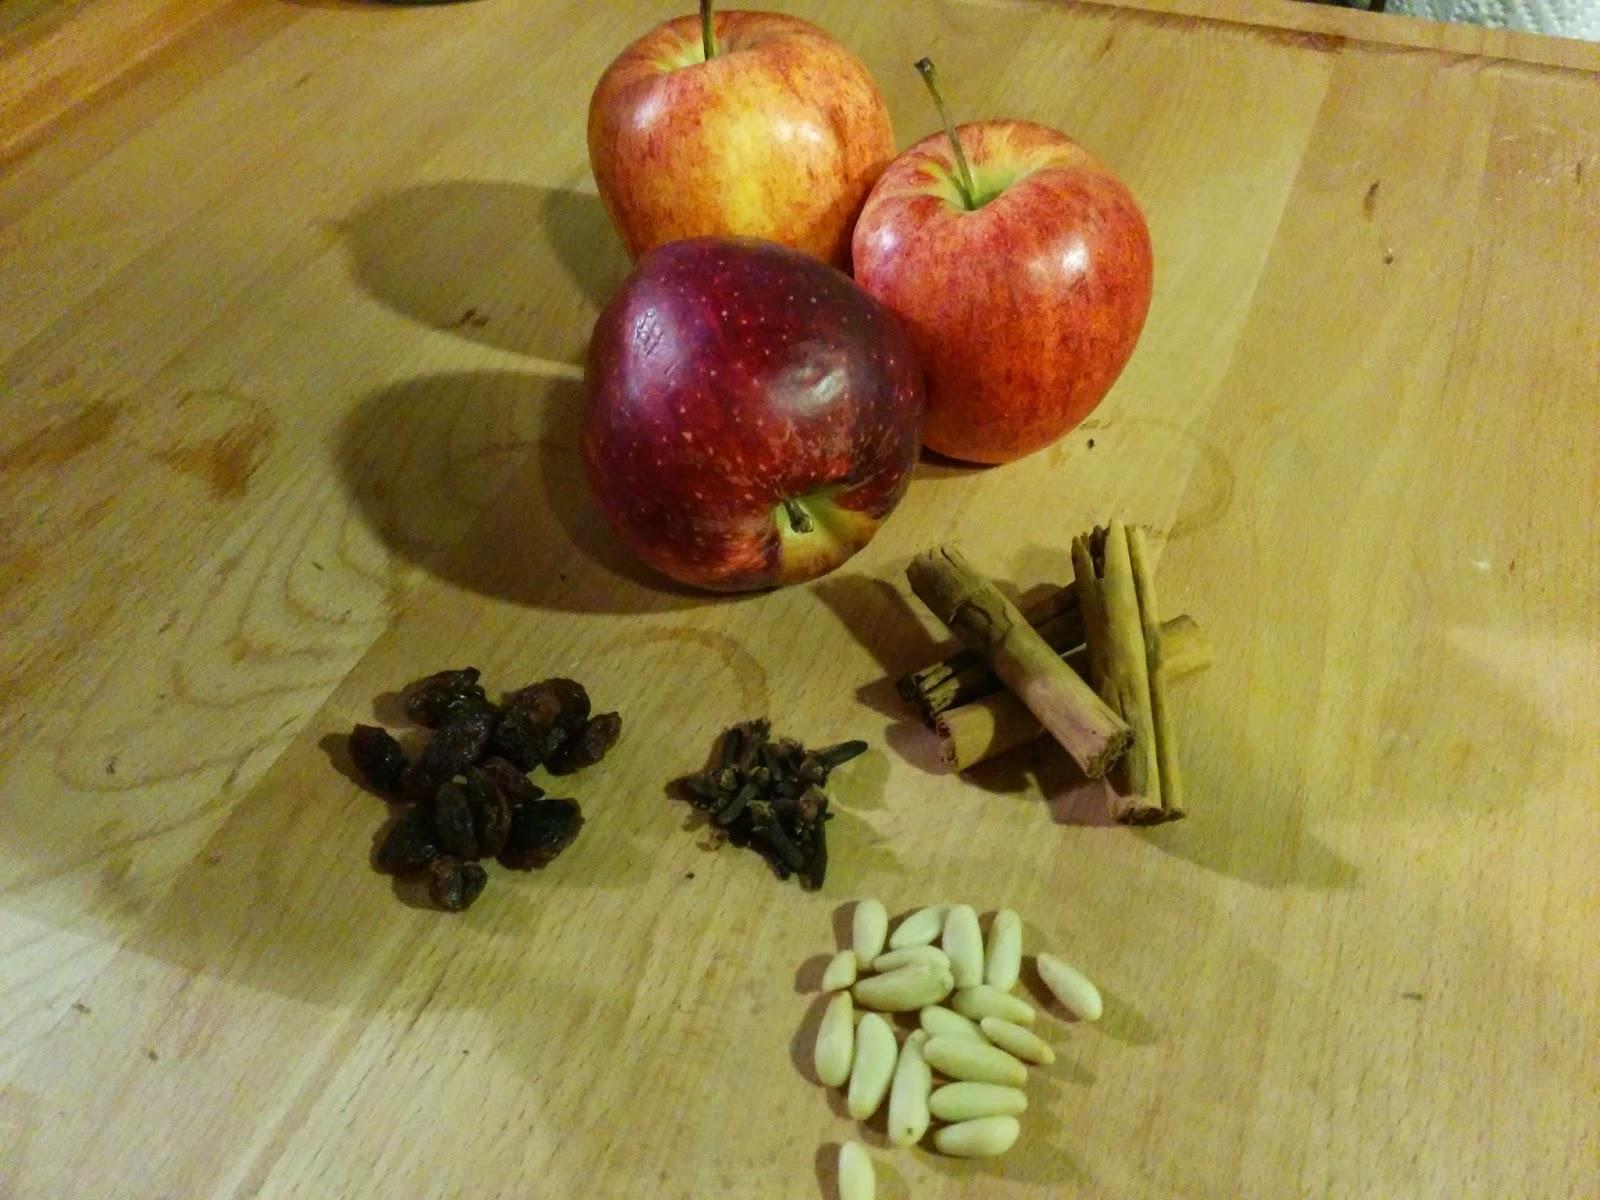 ingredienti della mela cotta